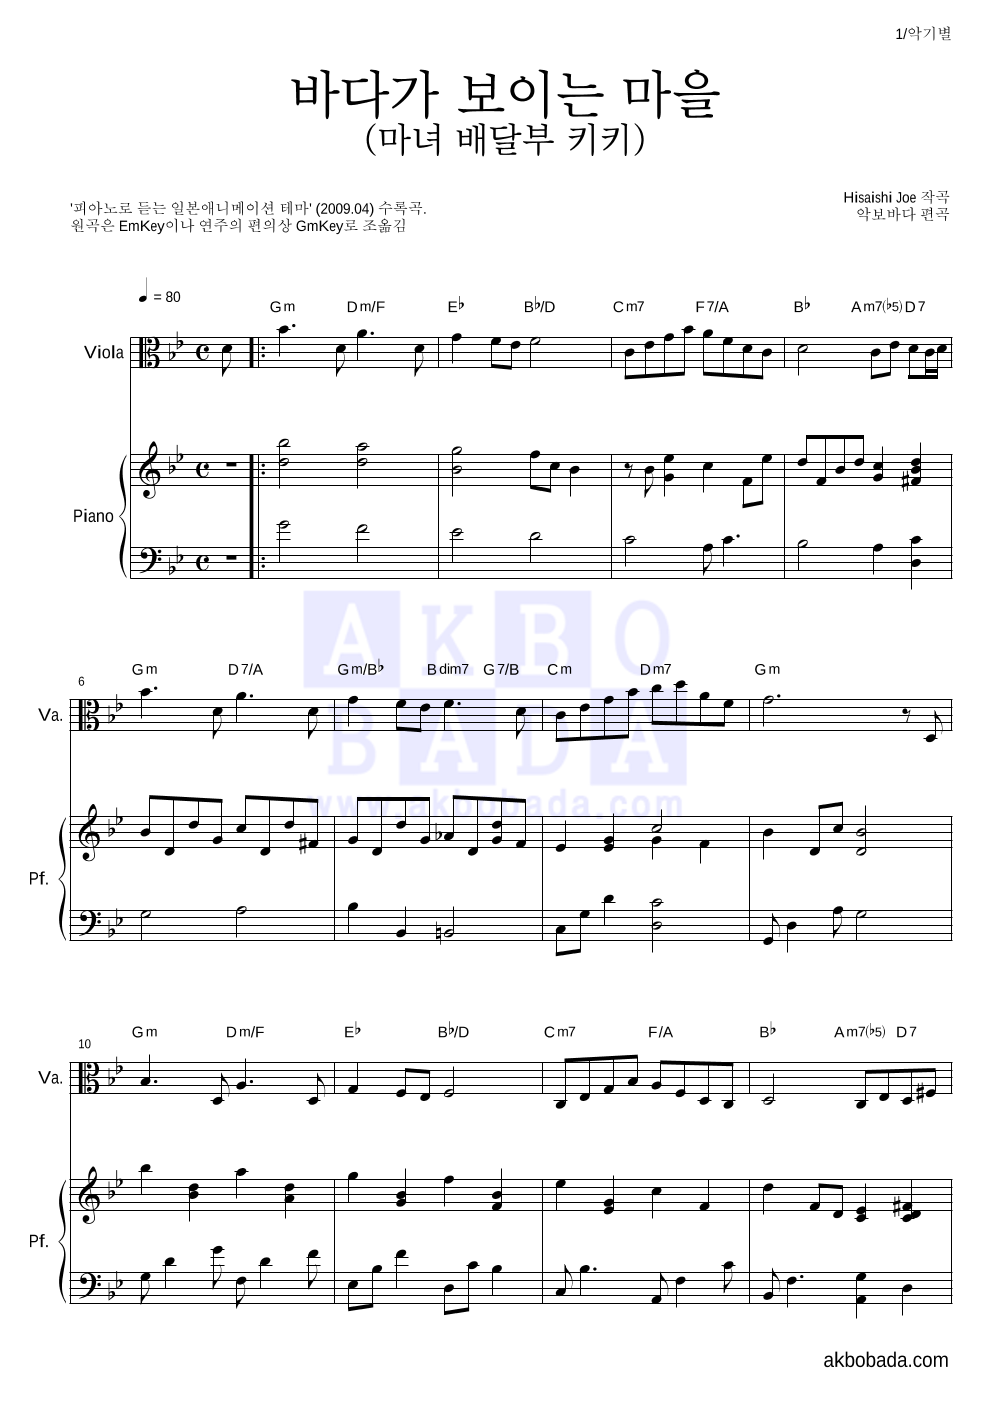 Hisaishi Joe - 海の見える街 / 바다가 보이는 마을 (마녀 배달부 키키) 비올라&피아노 악보